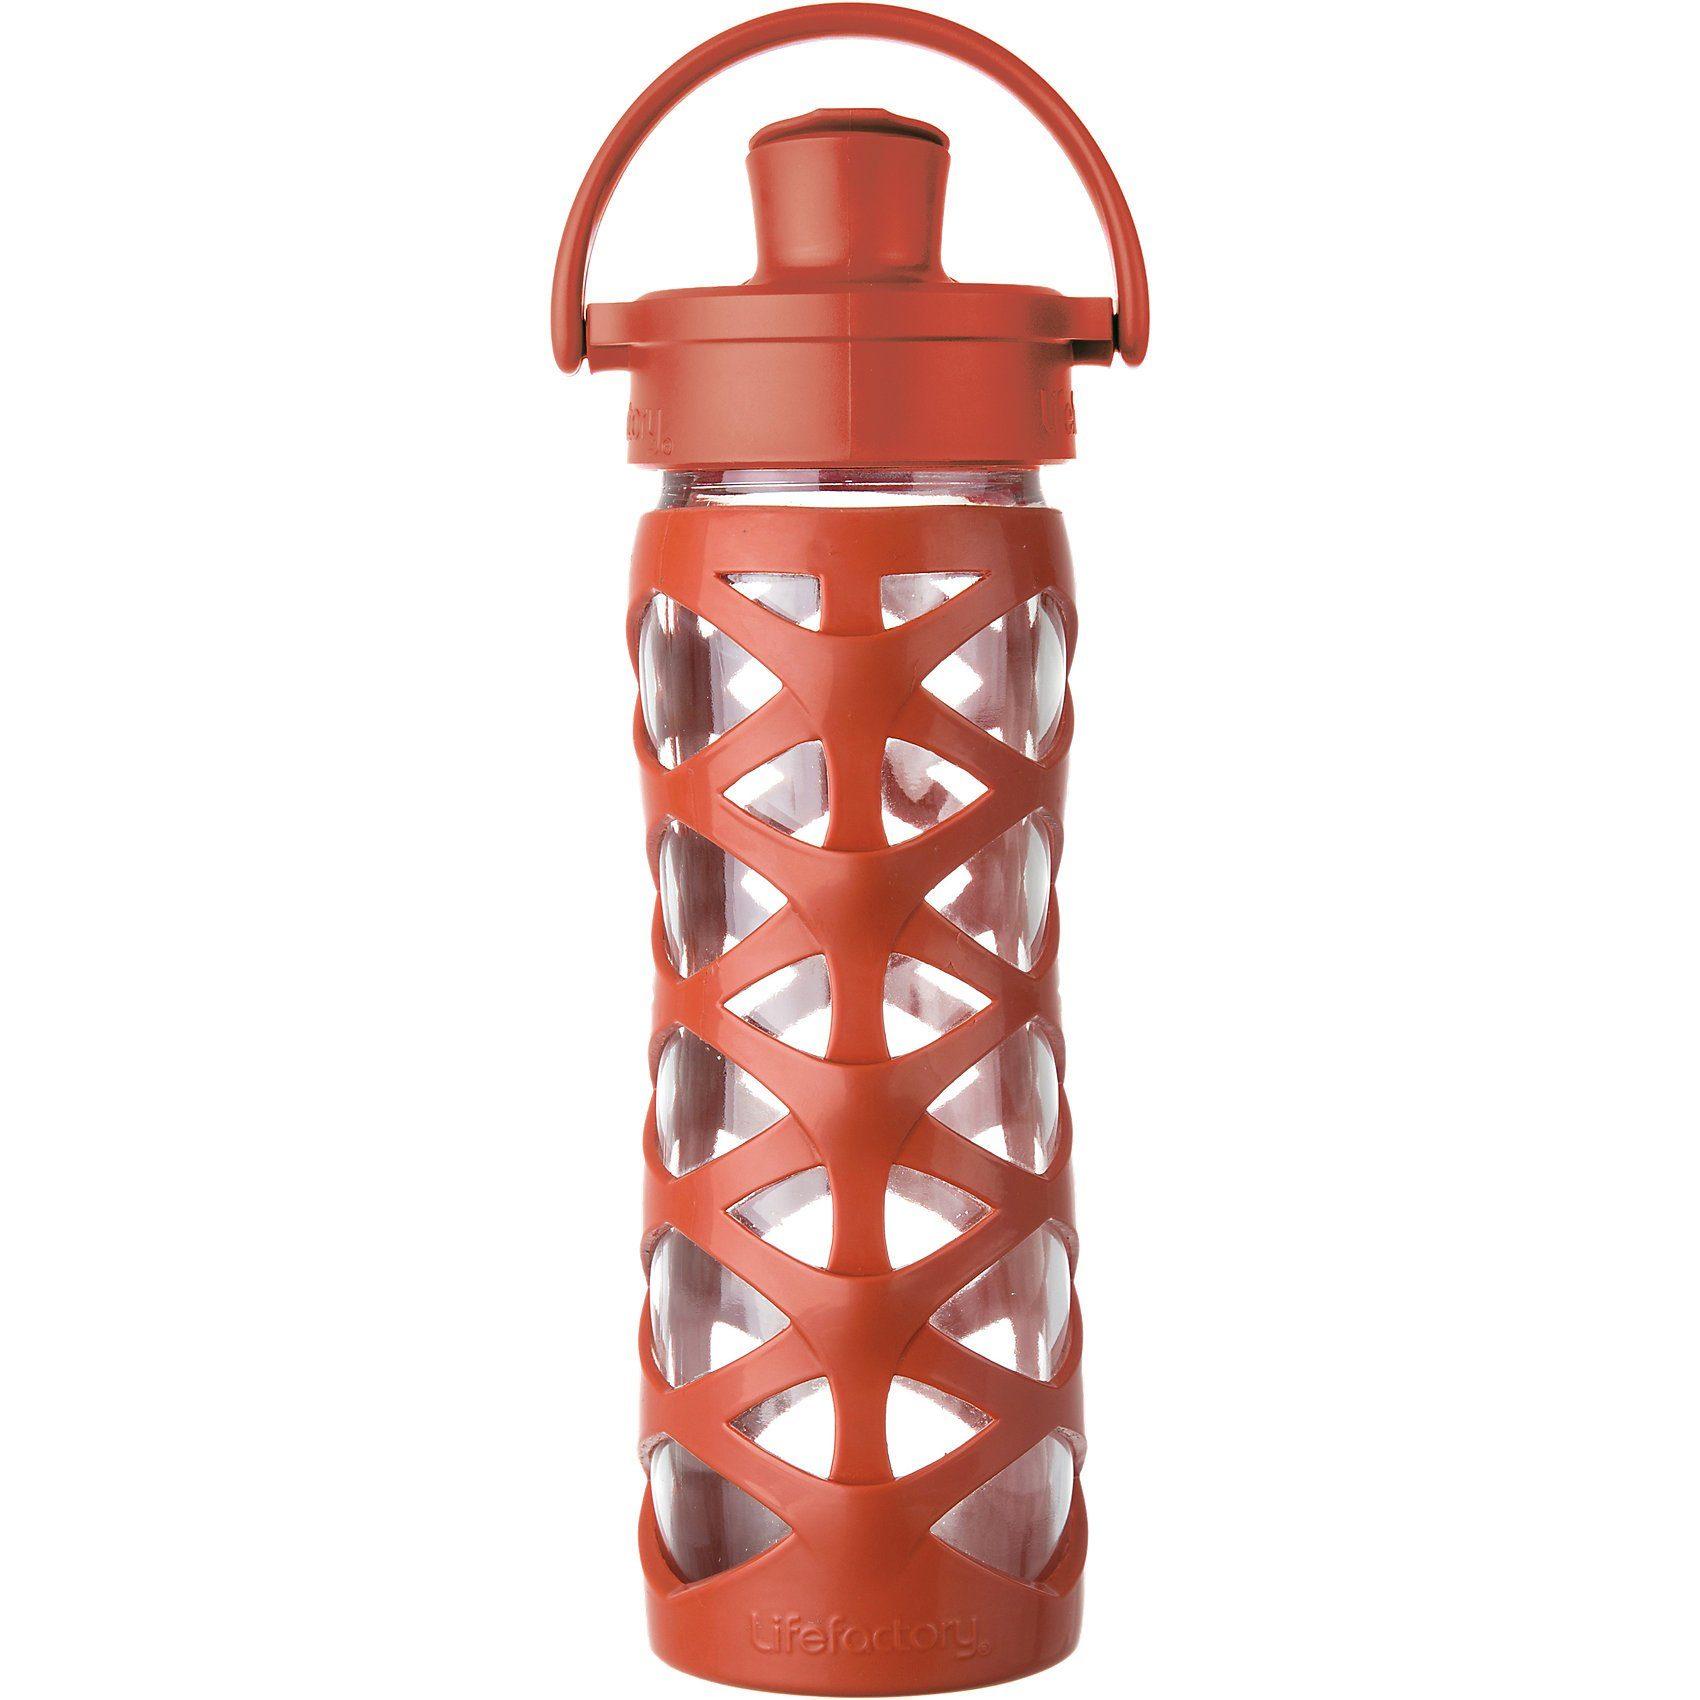 Lifefactory Trinkflasche Glas Golden Gate Orange Active Flip Cap, 475 ml